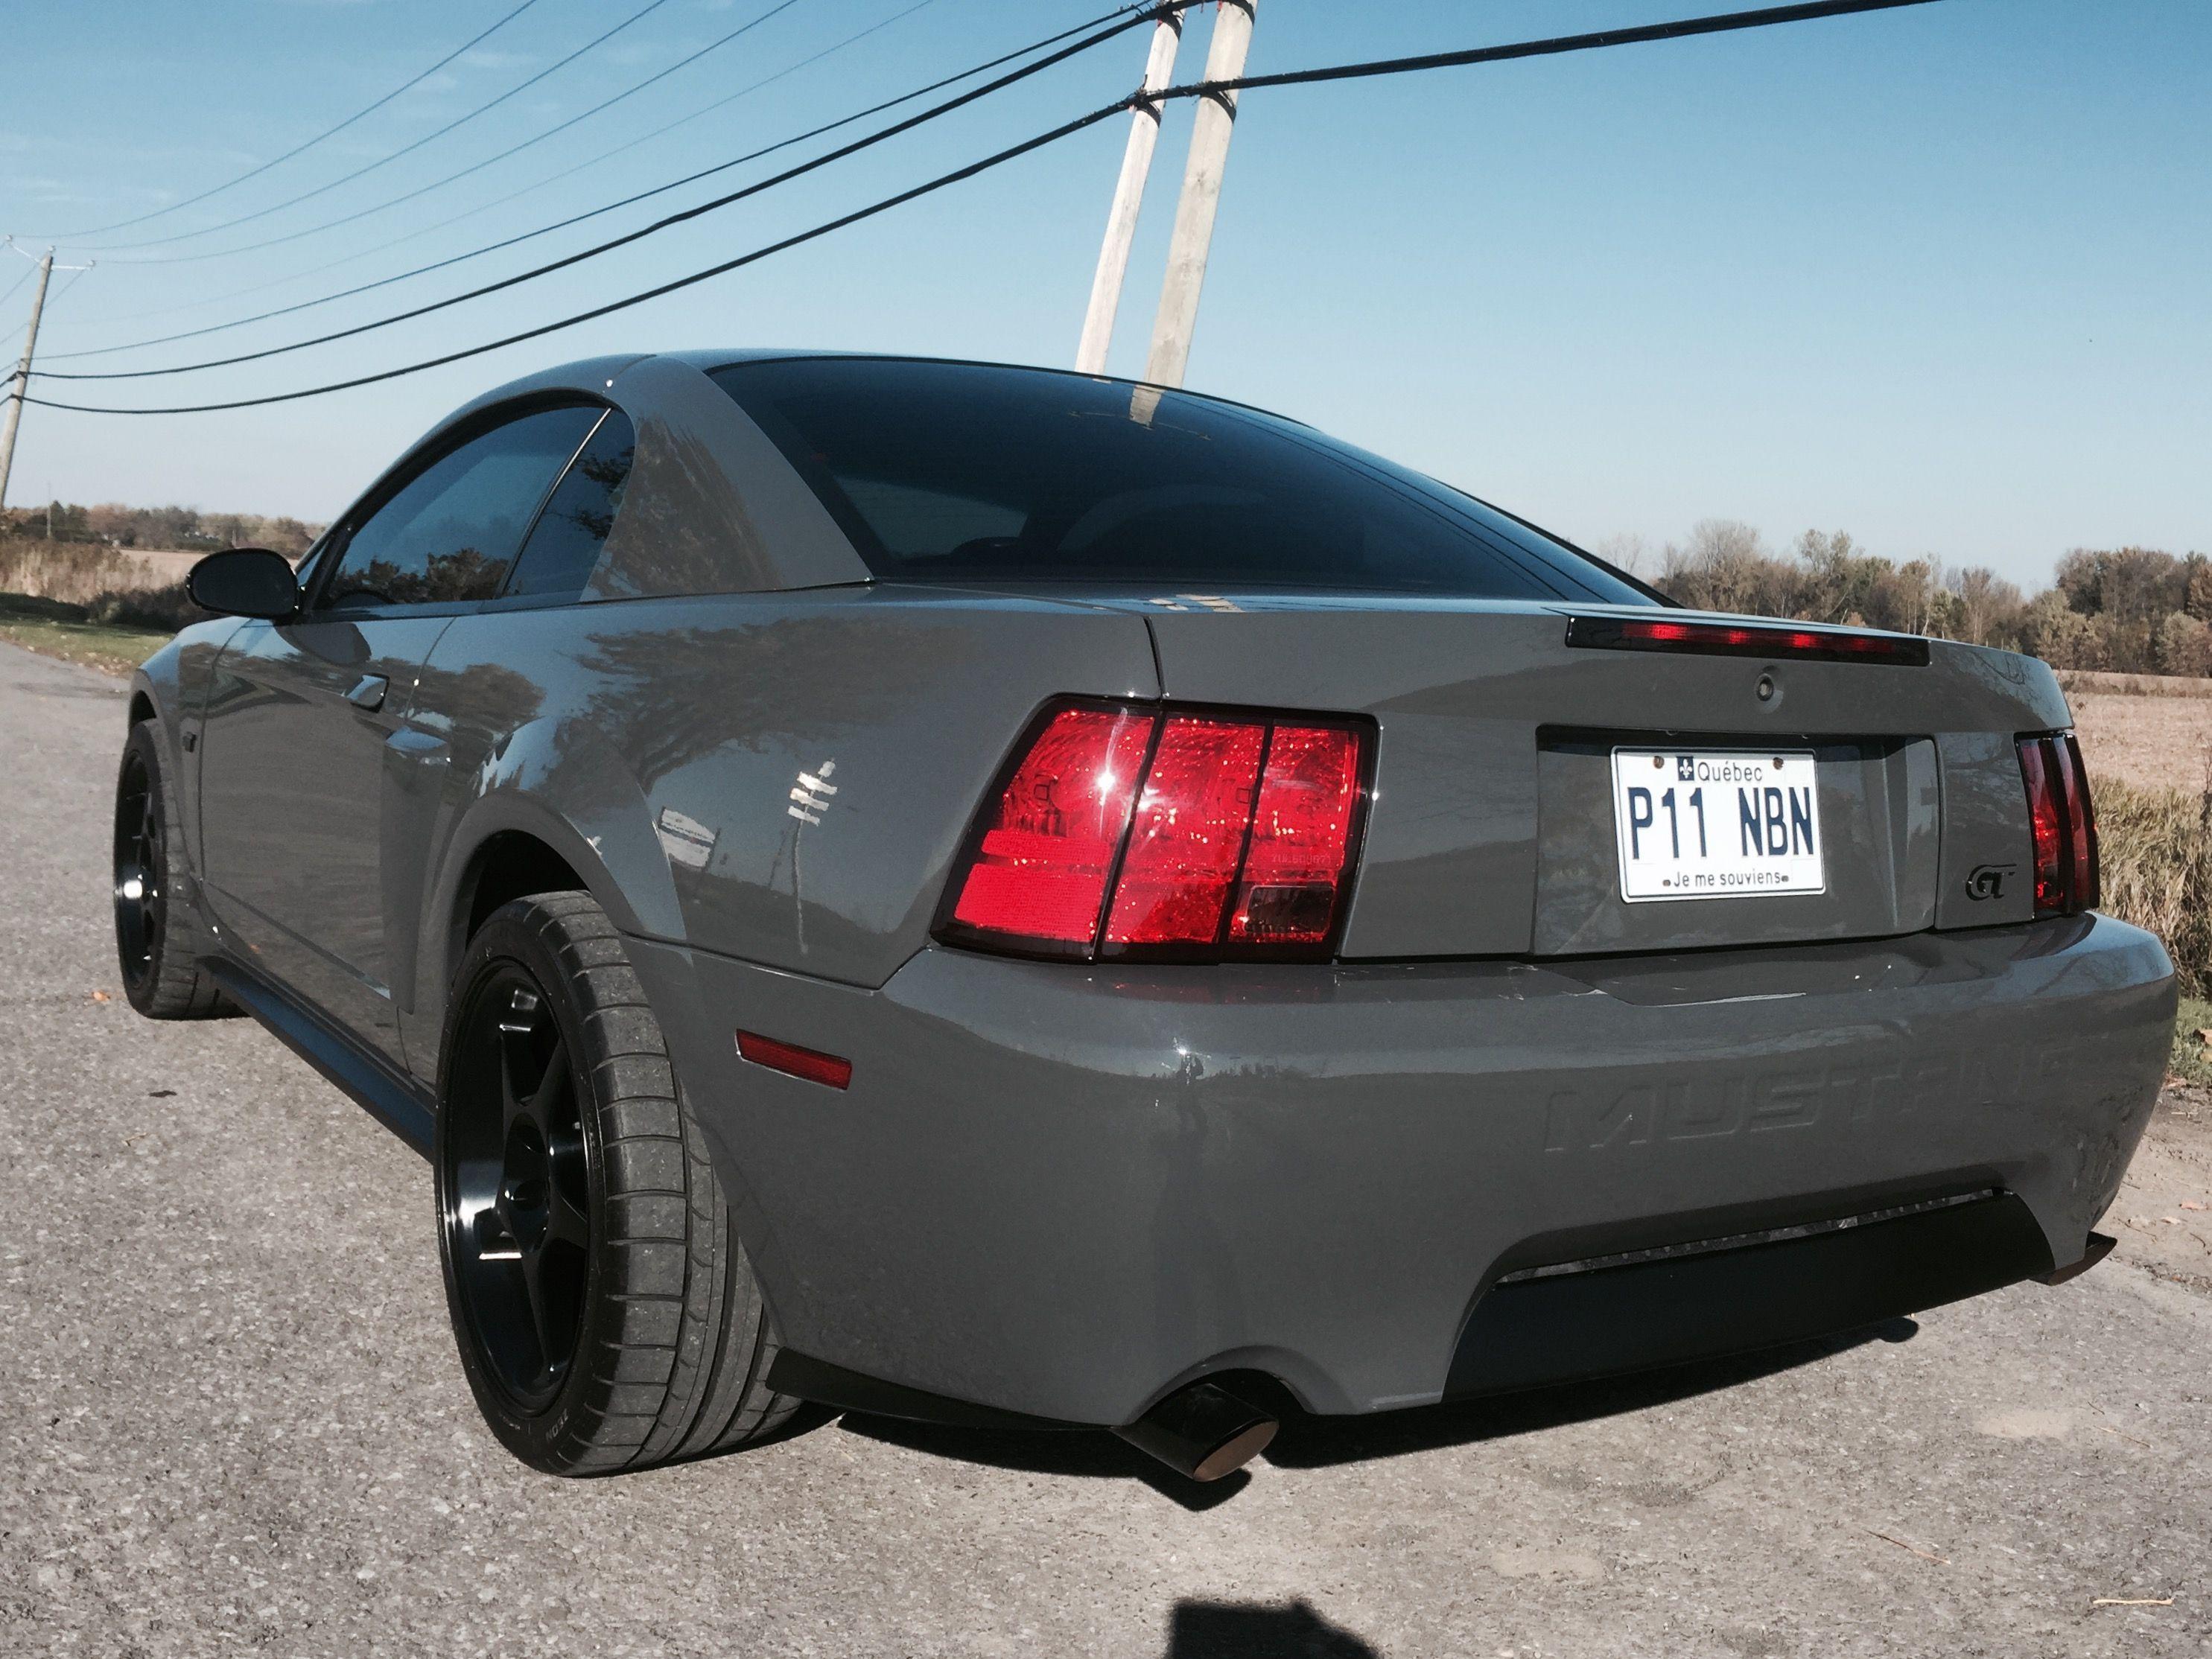 Mustang 99 04 Ford Mustang Cobra Mustang Cars Mustang Gt